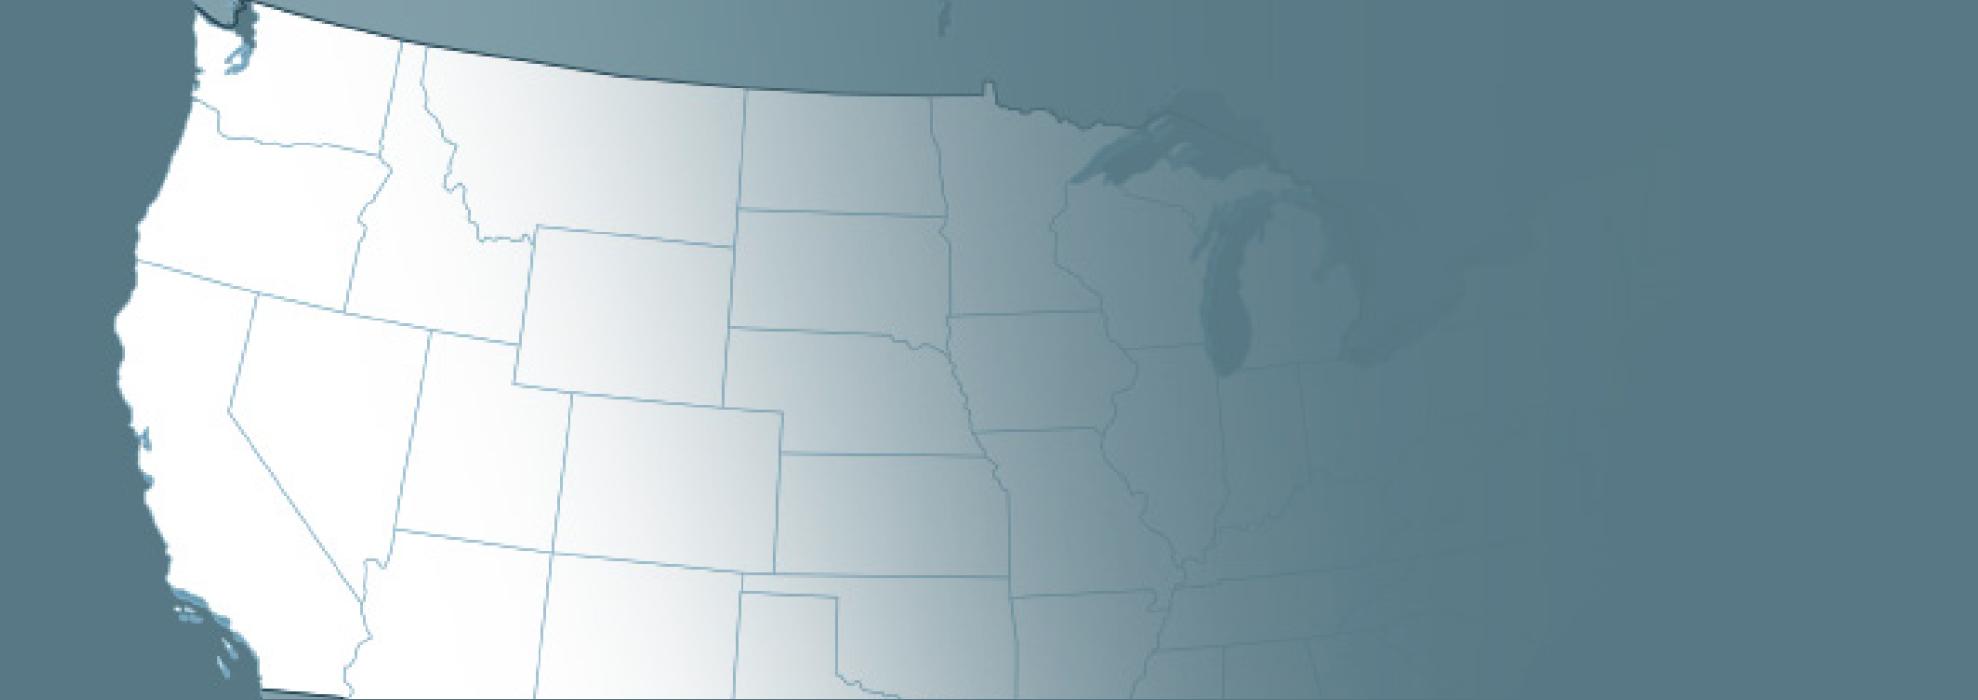 Why the Western U.S. Needs Energy Storage